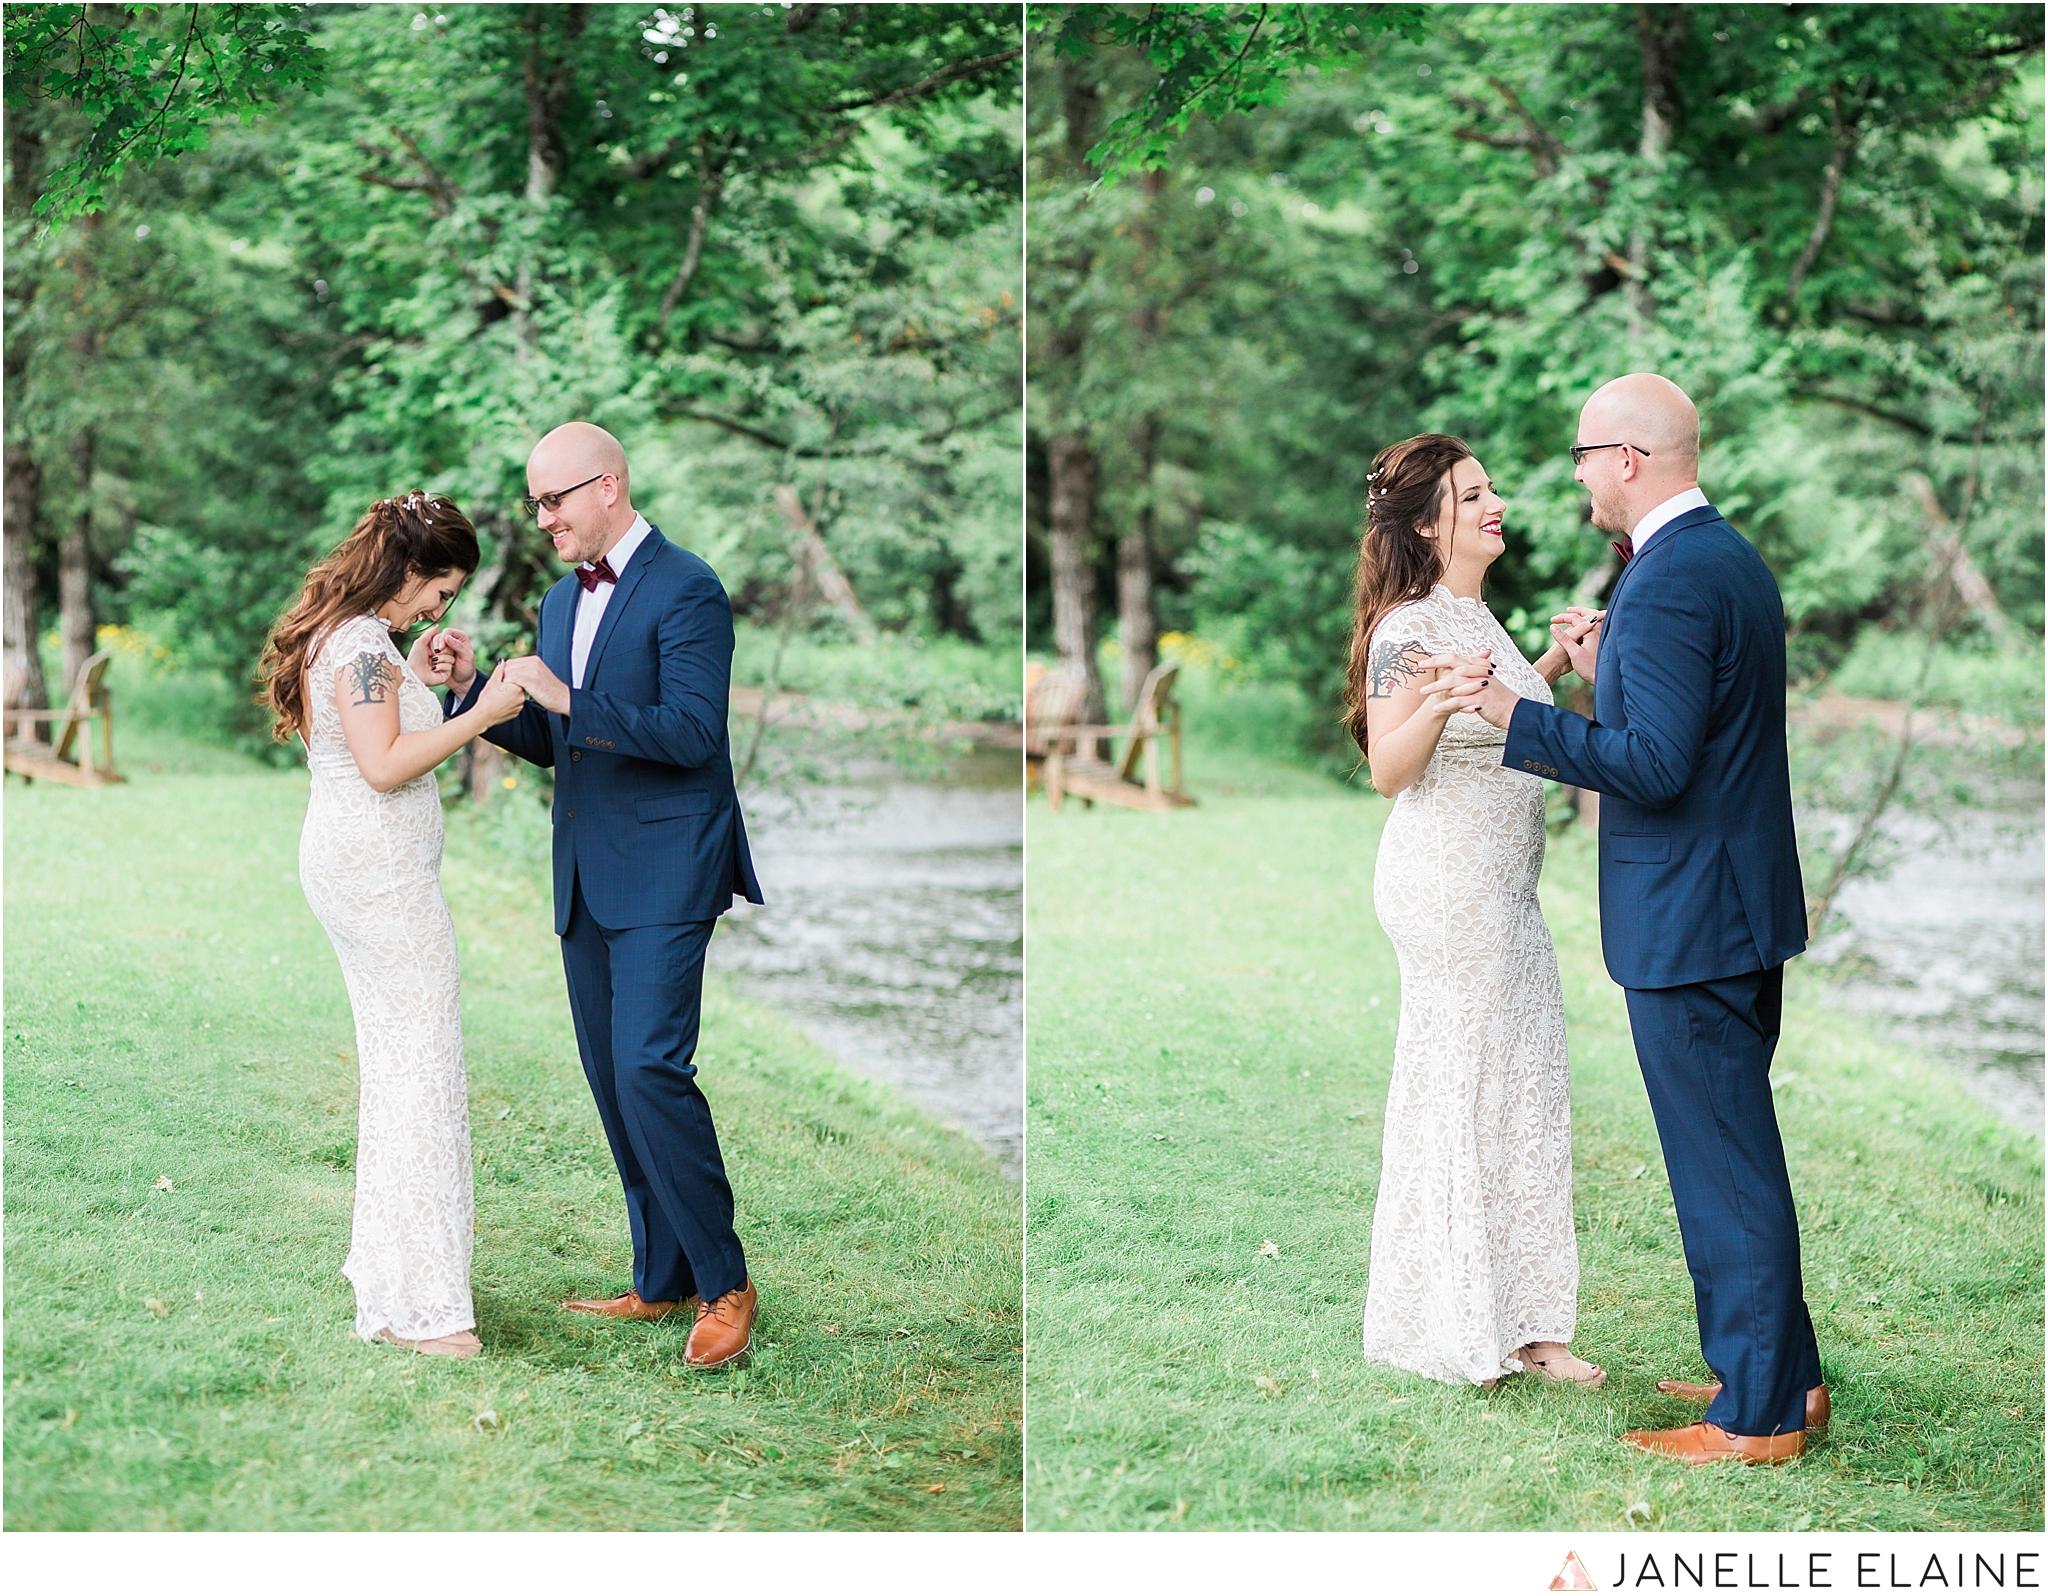 janelle elaine photography-seattle-destination-wedding-photographer-16.jpg